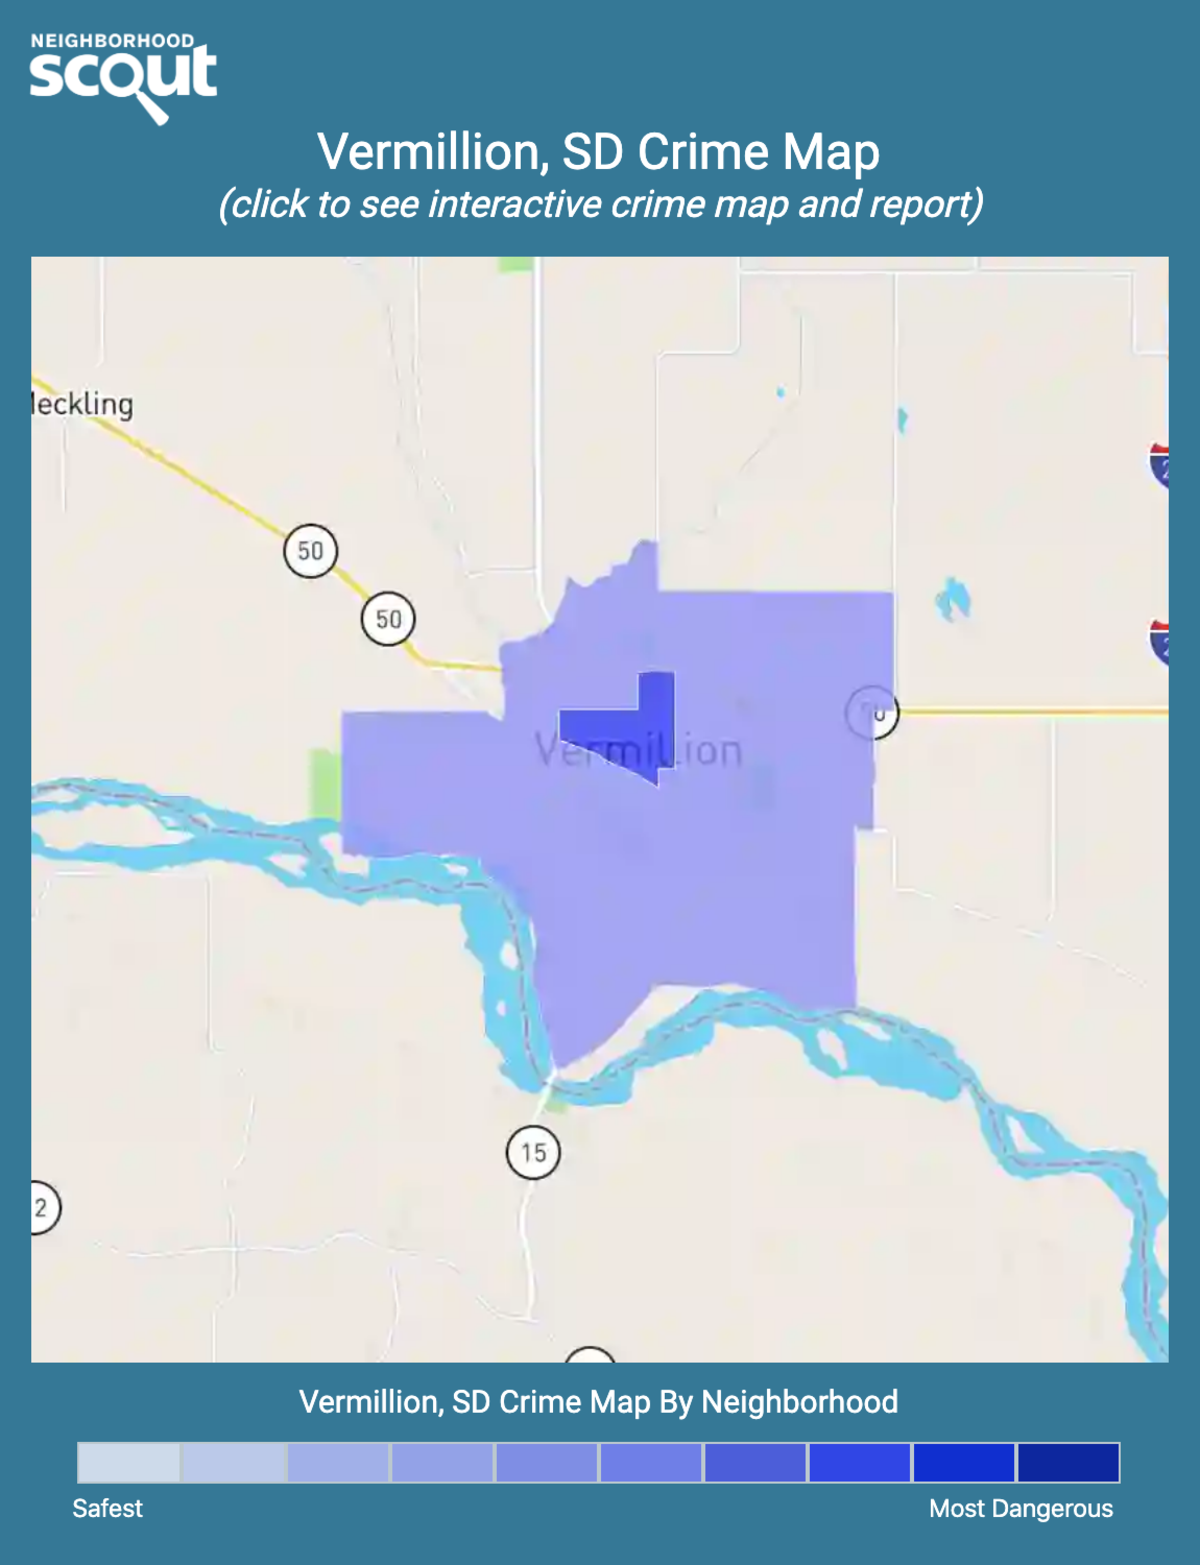 Vermillion, South Dakota crime map